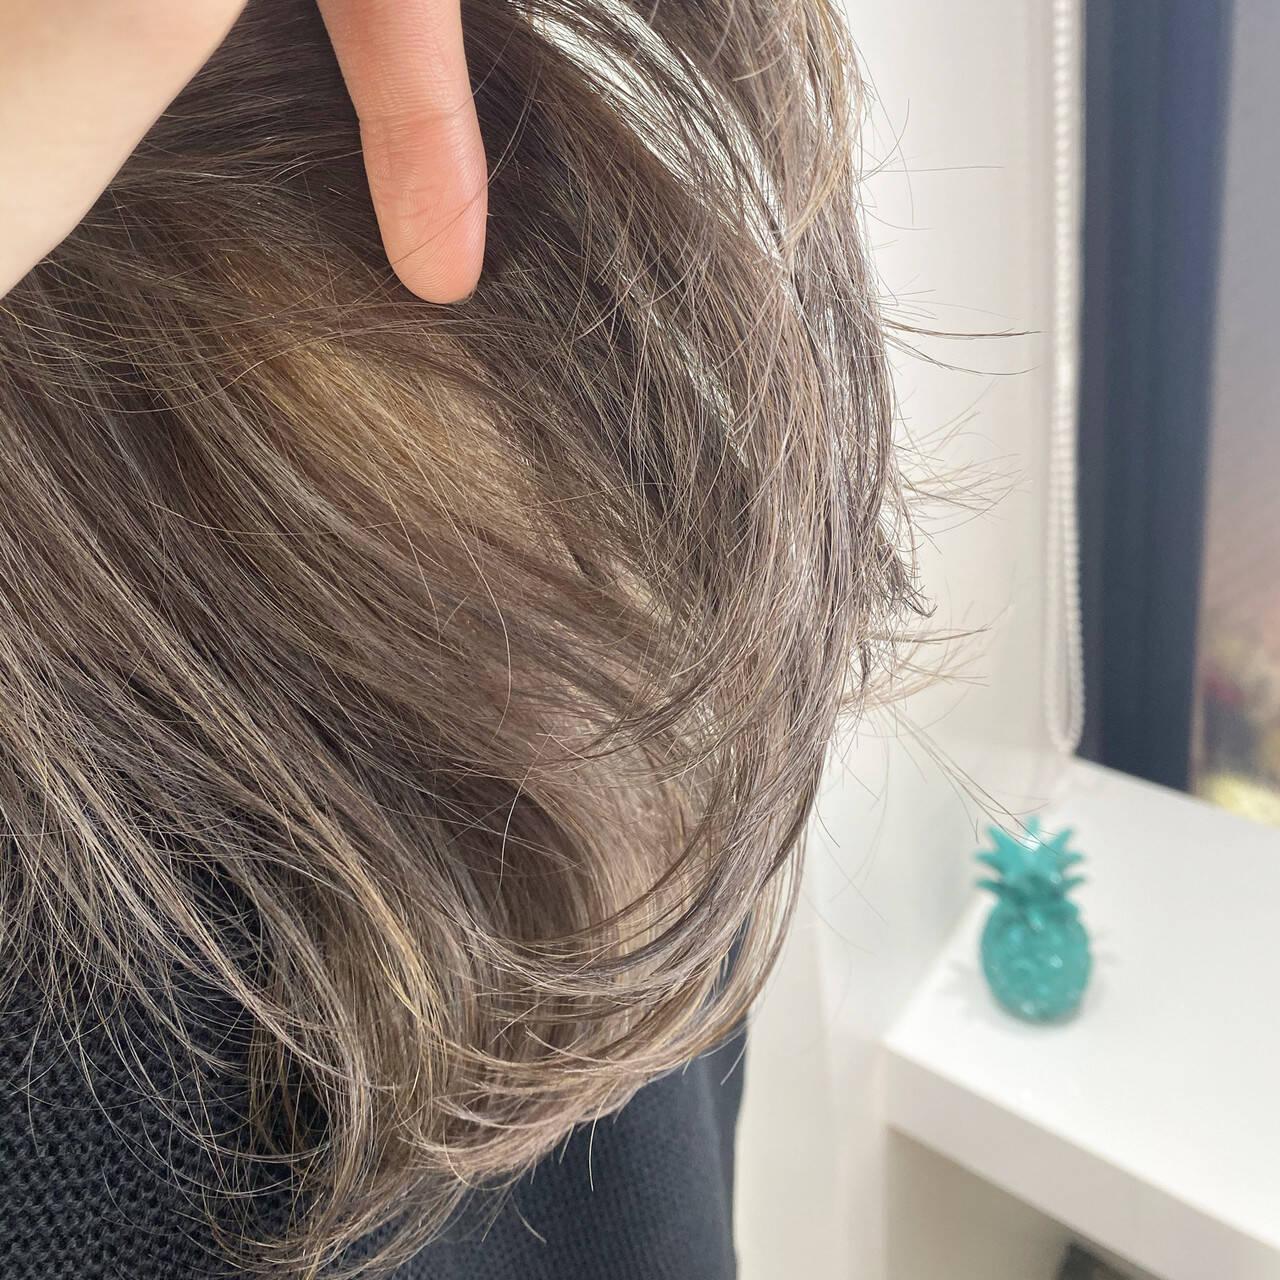 3Dハイライト ハイライト ブリーチカラー グレージュヘアスタイルや髪型の写真・画像